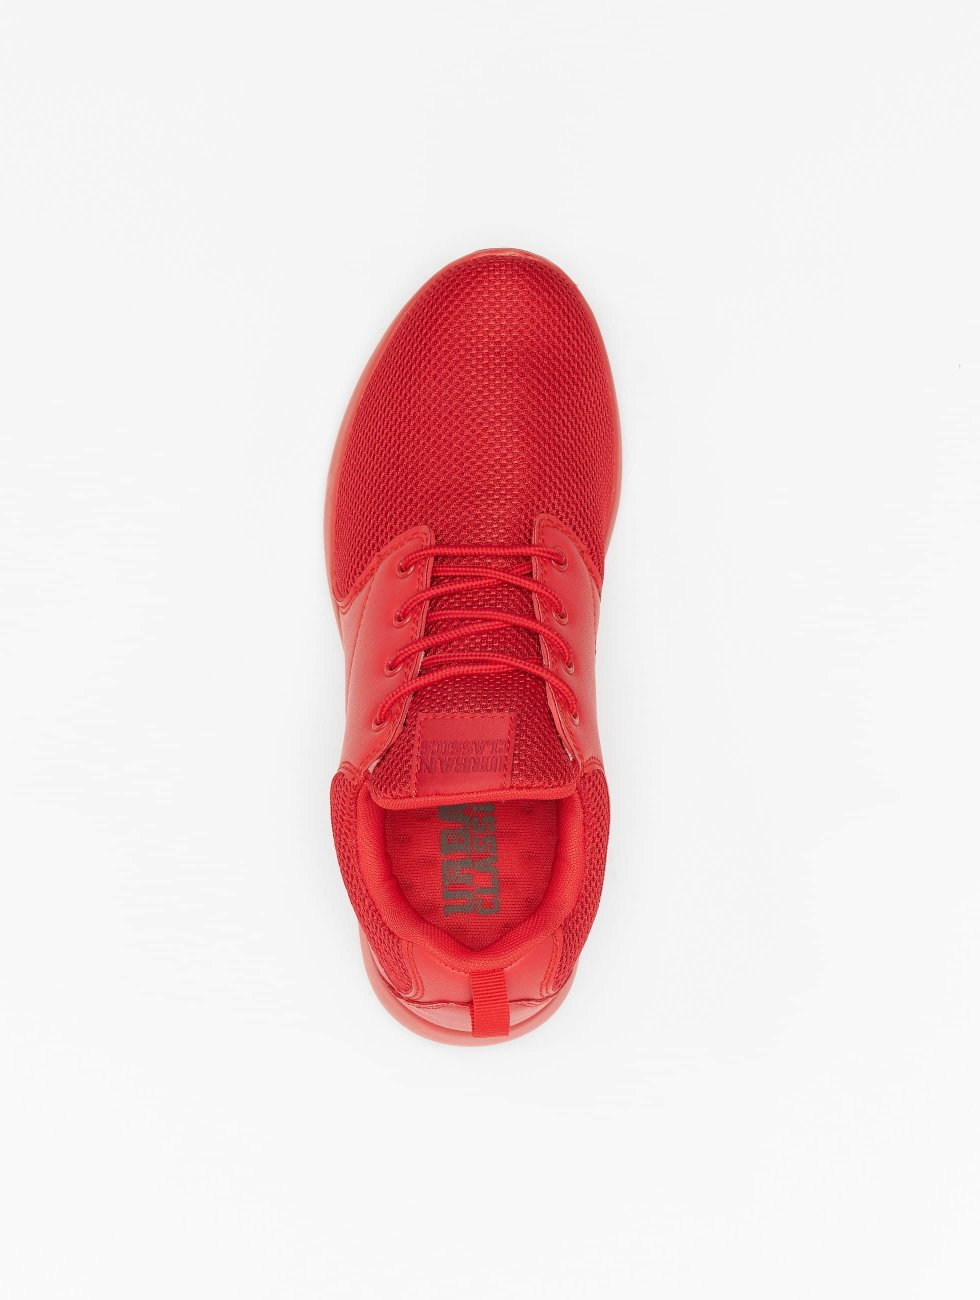 Gratis Verzending Met Paypal Urban Classics schoen / sneaker Light Runner in rood 263822 Verkoop Grote Verkoop goedkoop 2018 Te Koop Korting Nicekicks Gesb5s4Tye